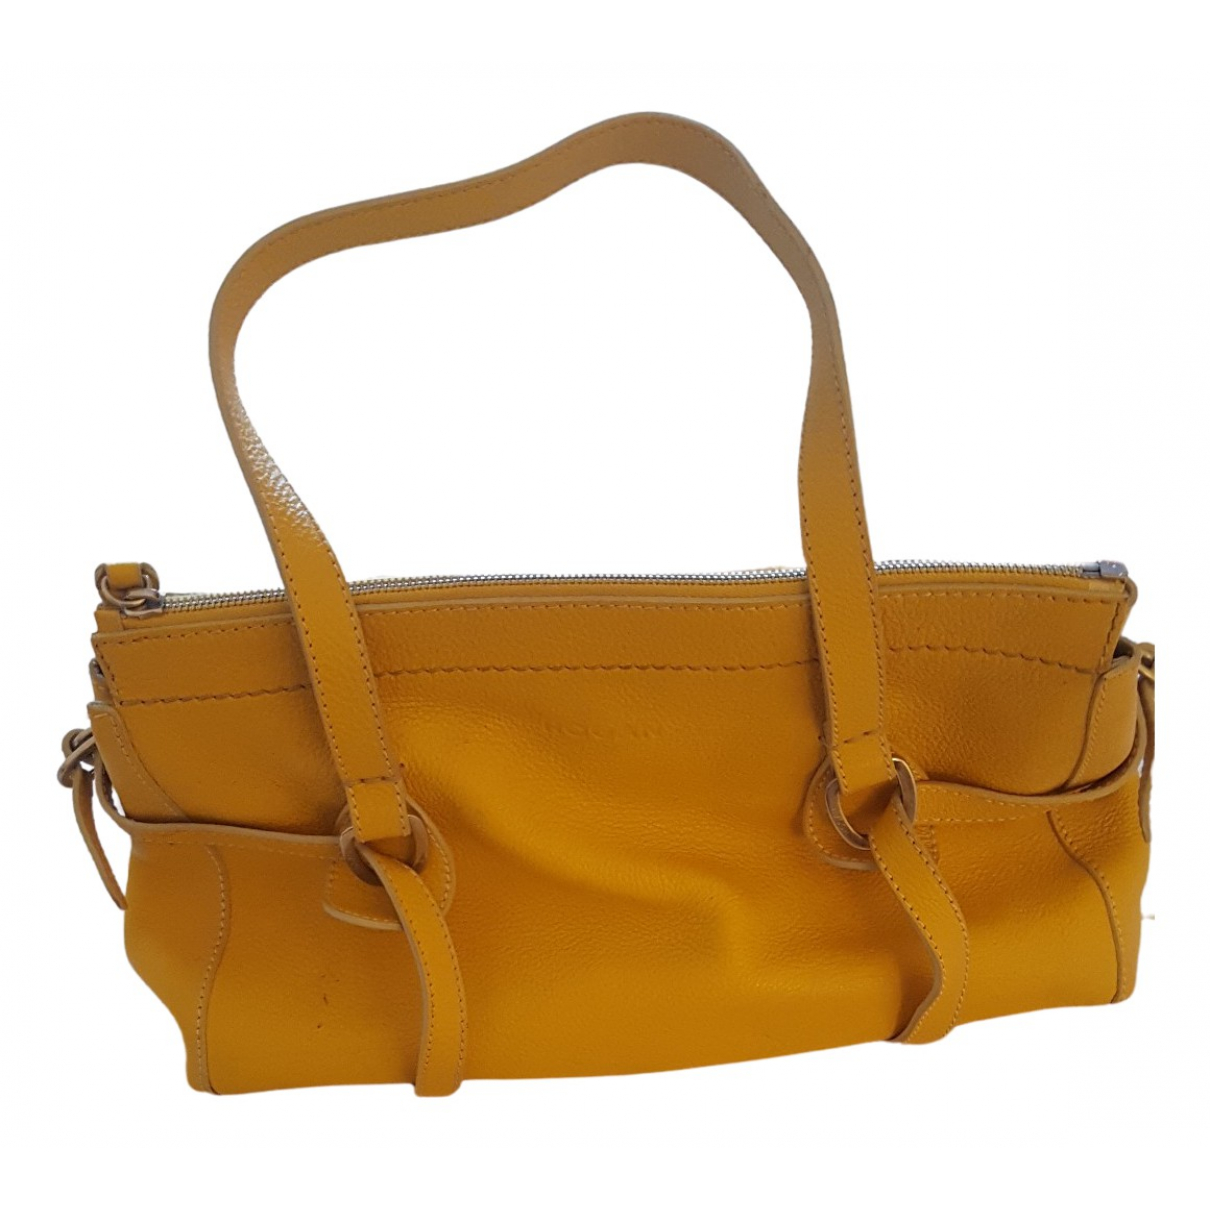 Hogan \N Yellow Leather handbag for Women \N